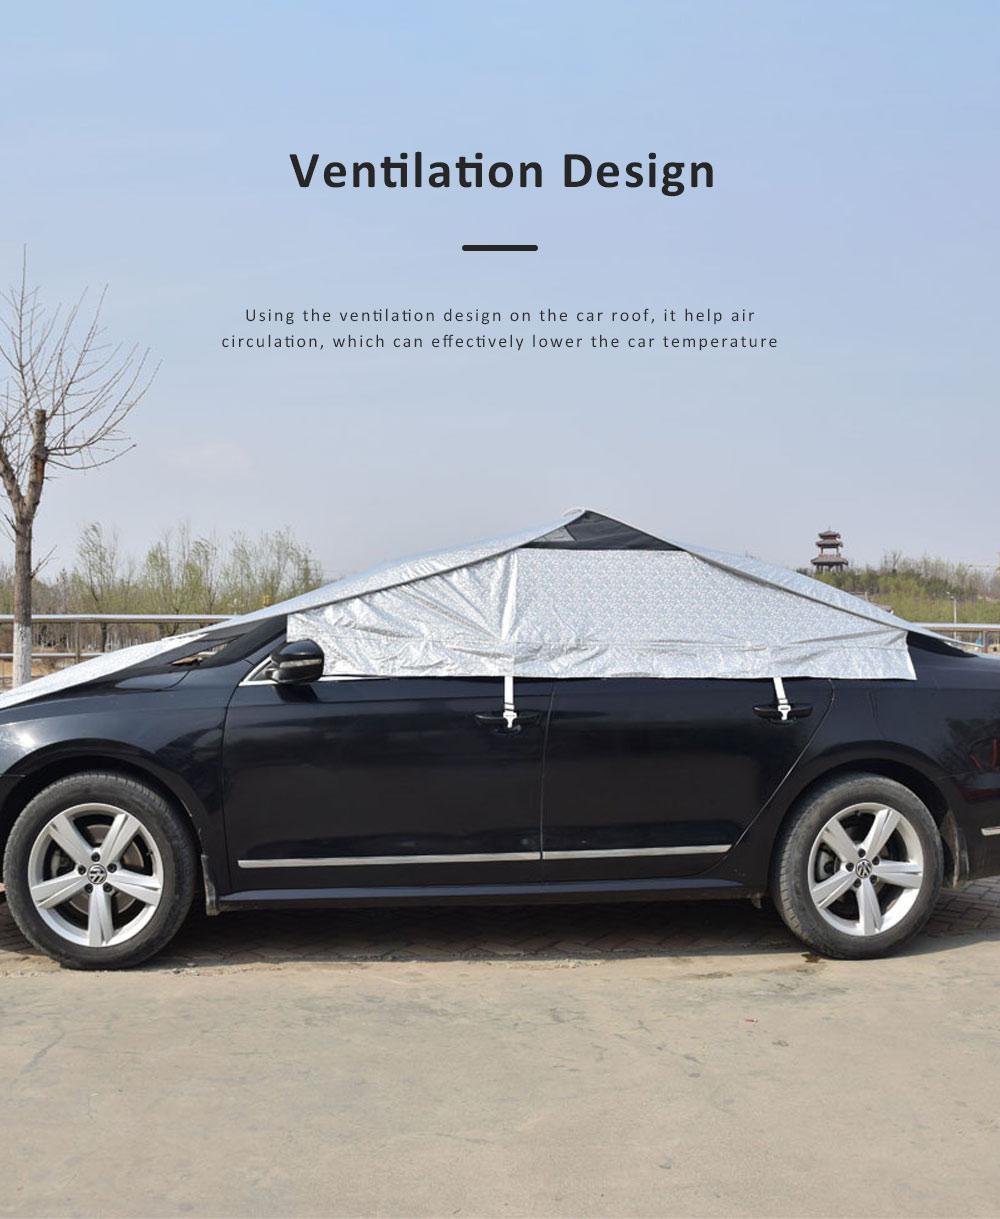 Universal Car Sunshade UV Ray Protector Cooler Umbrella Fabric Sunshade for Cars 2